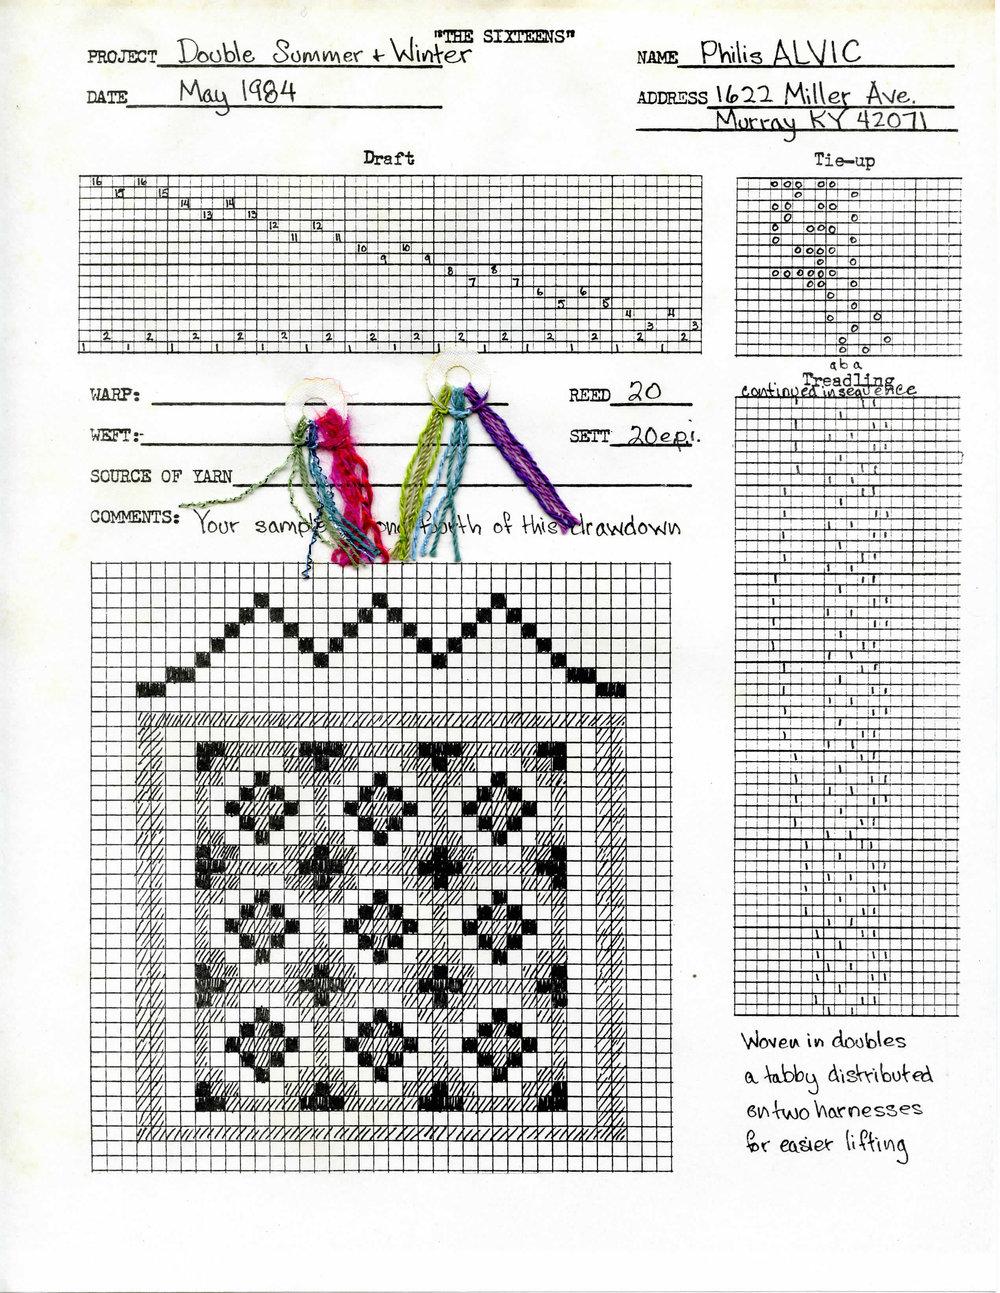 1984_Page_1_Image_0001.jpg